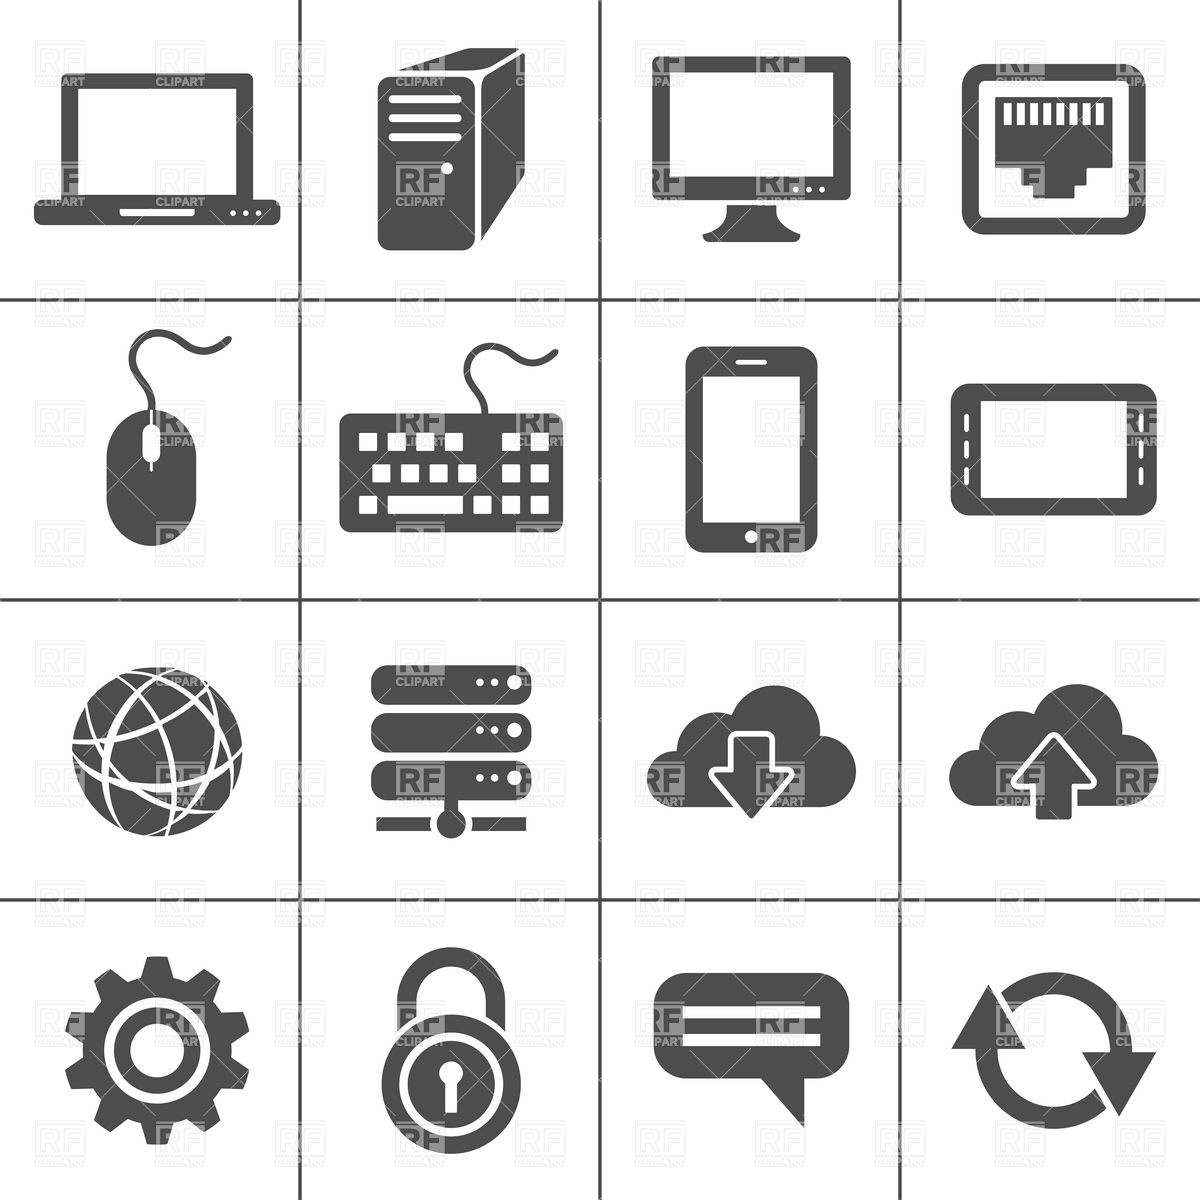 Free Computer Vector Icon